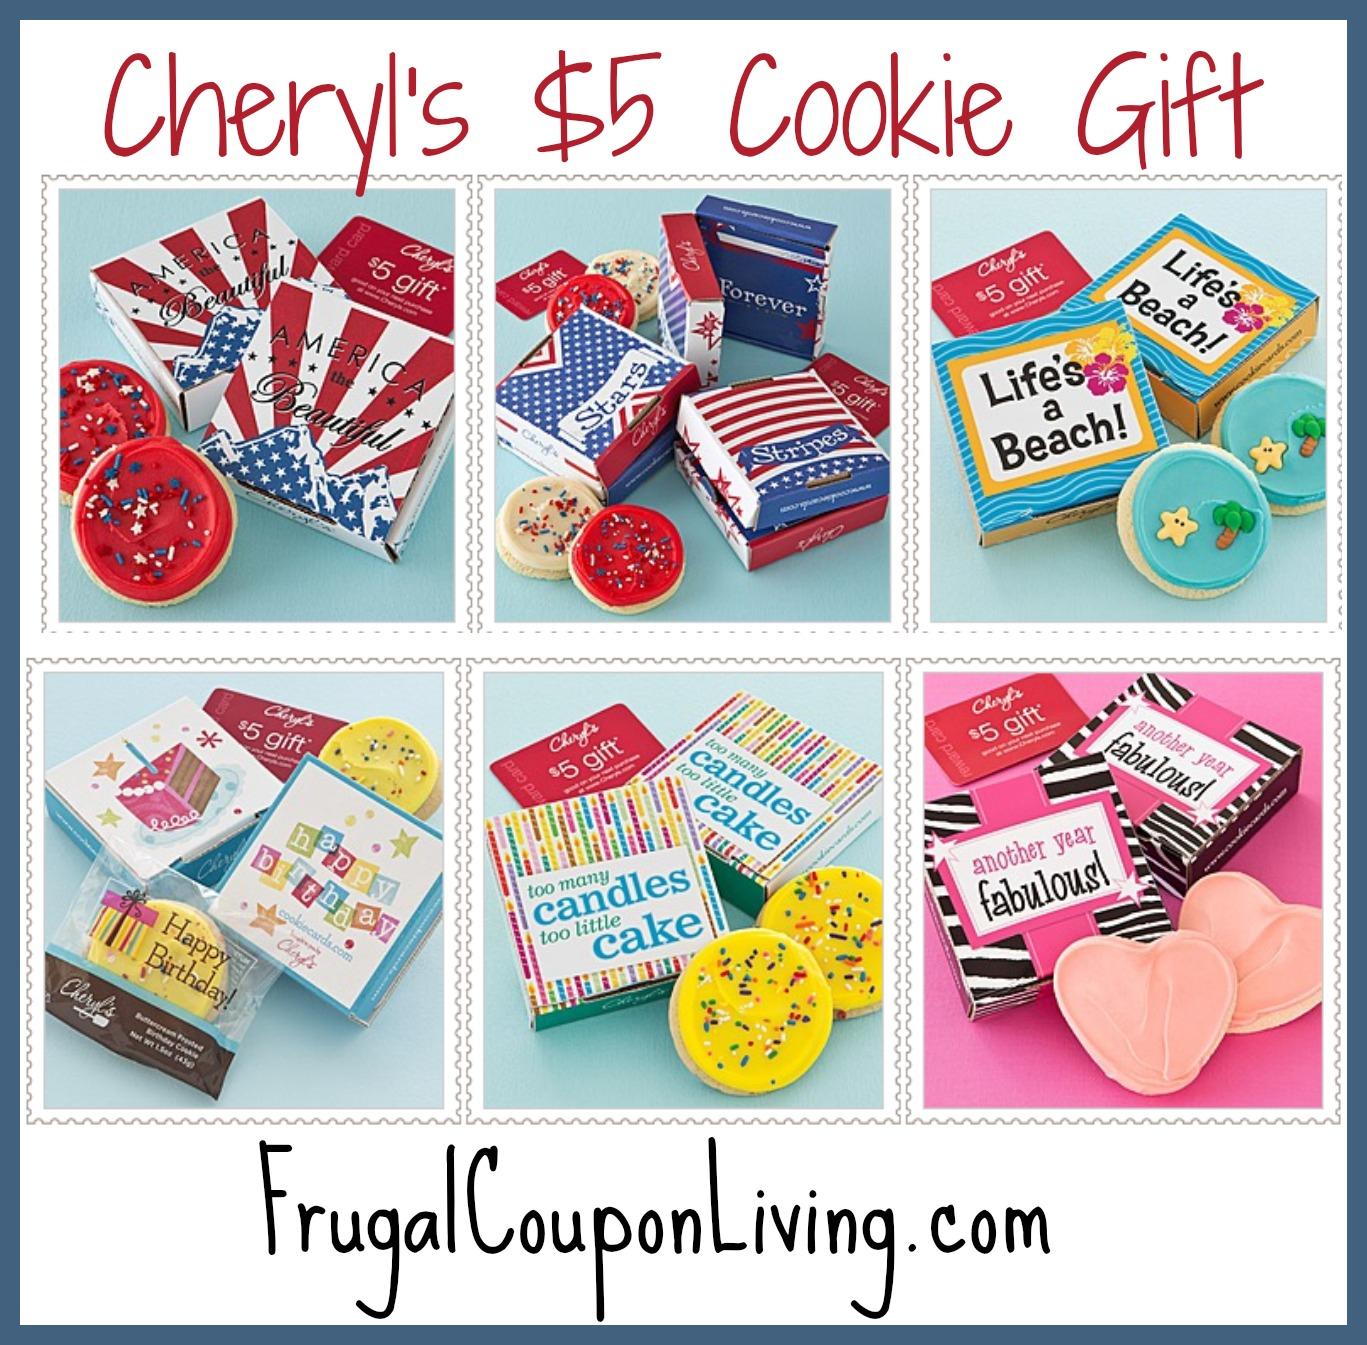 Cheryls promo code Hair coloring coupons